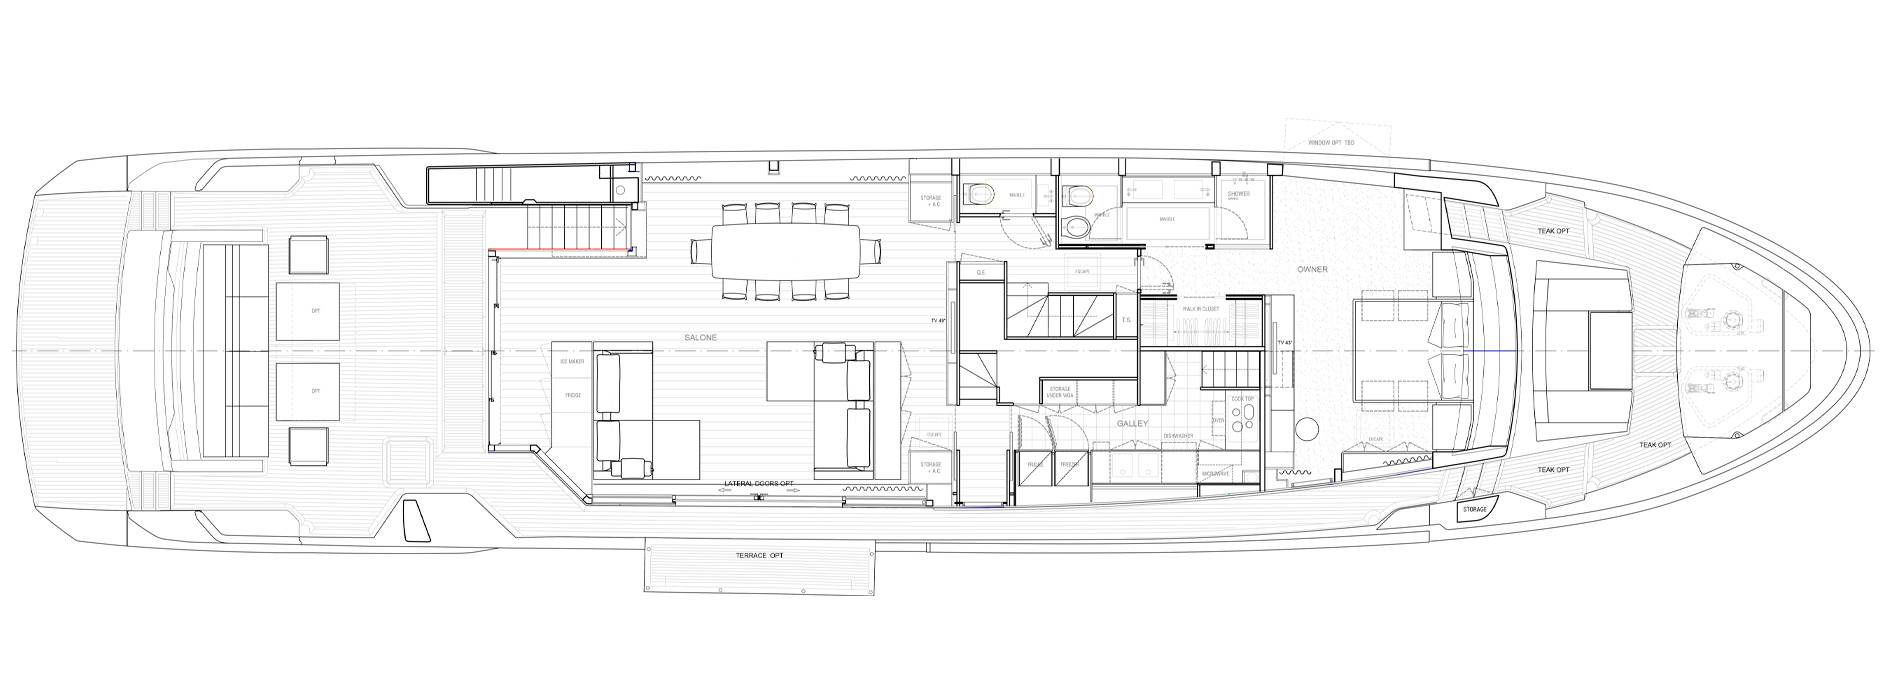 Sanlorenzo Yachts SL106 Asymmetric Hauptdeck